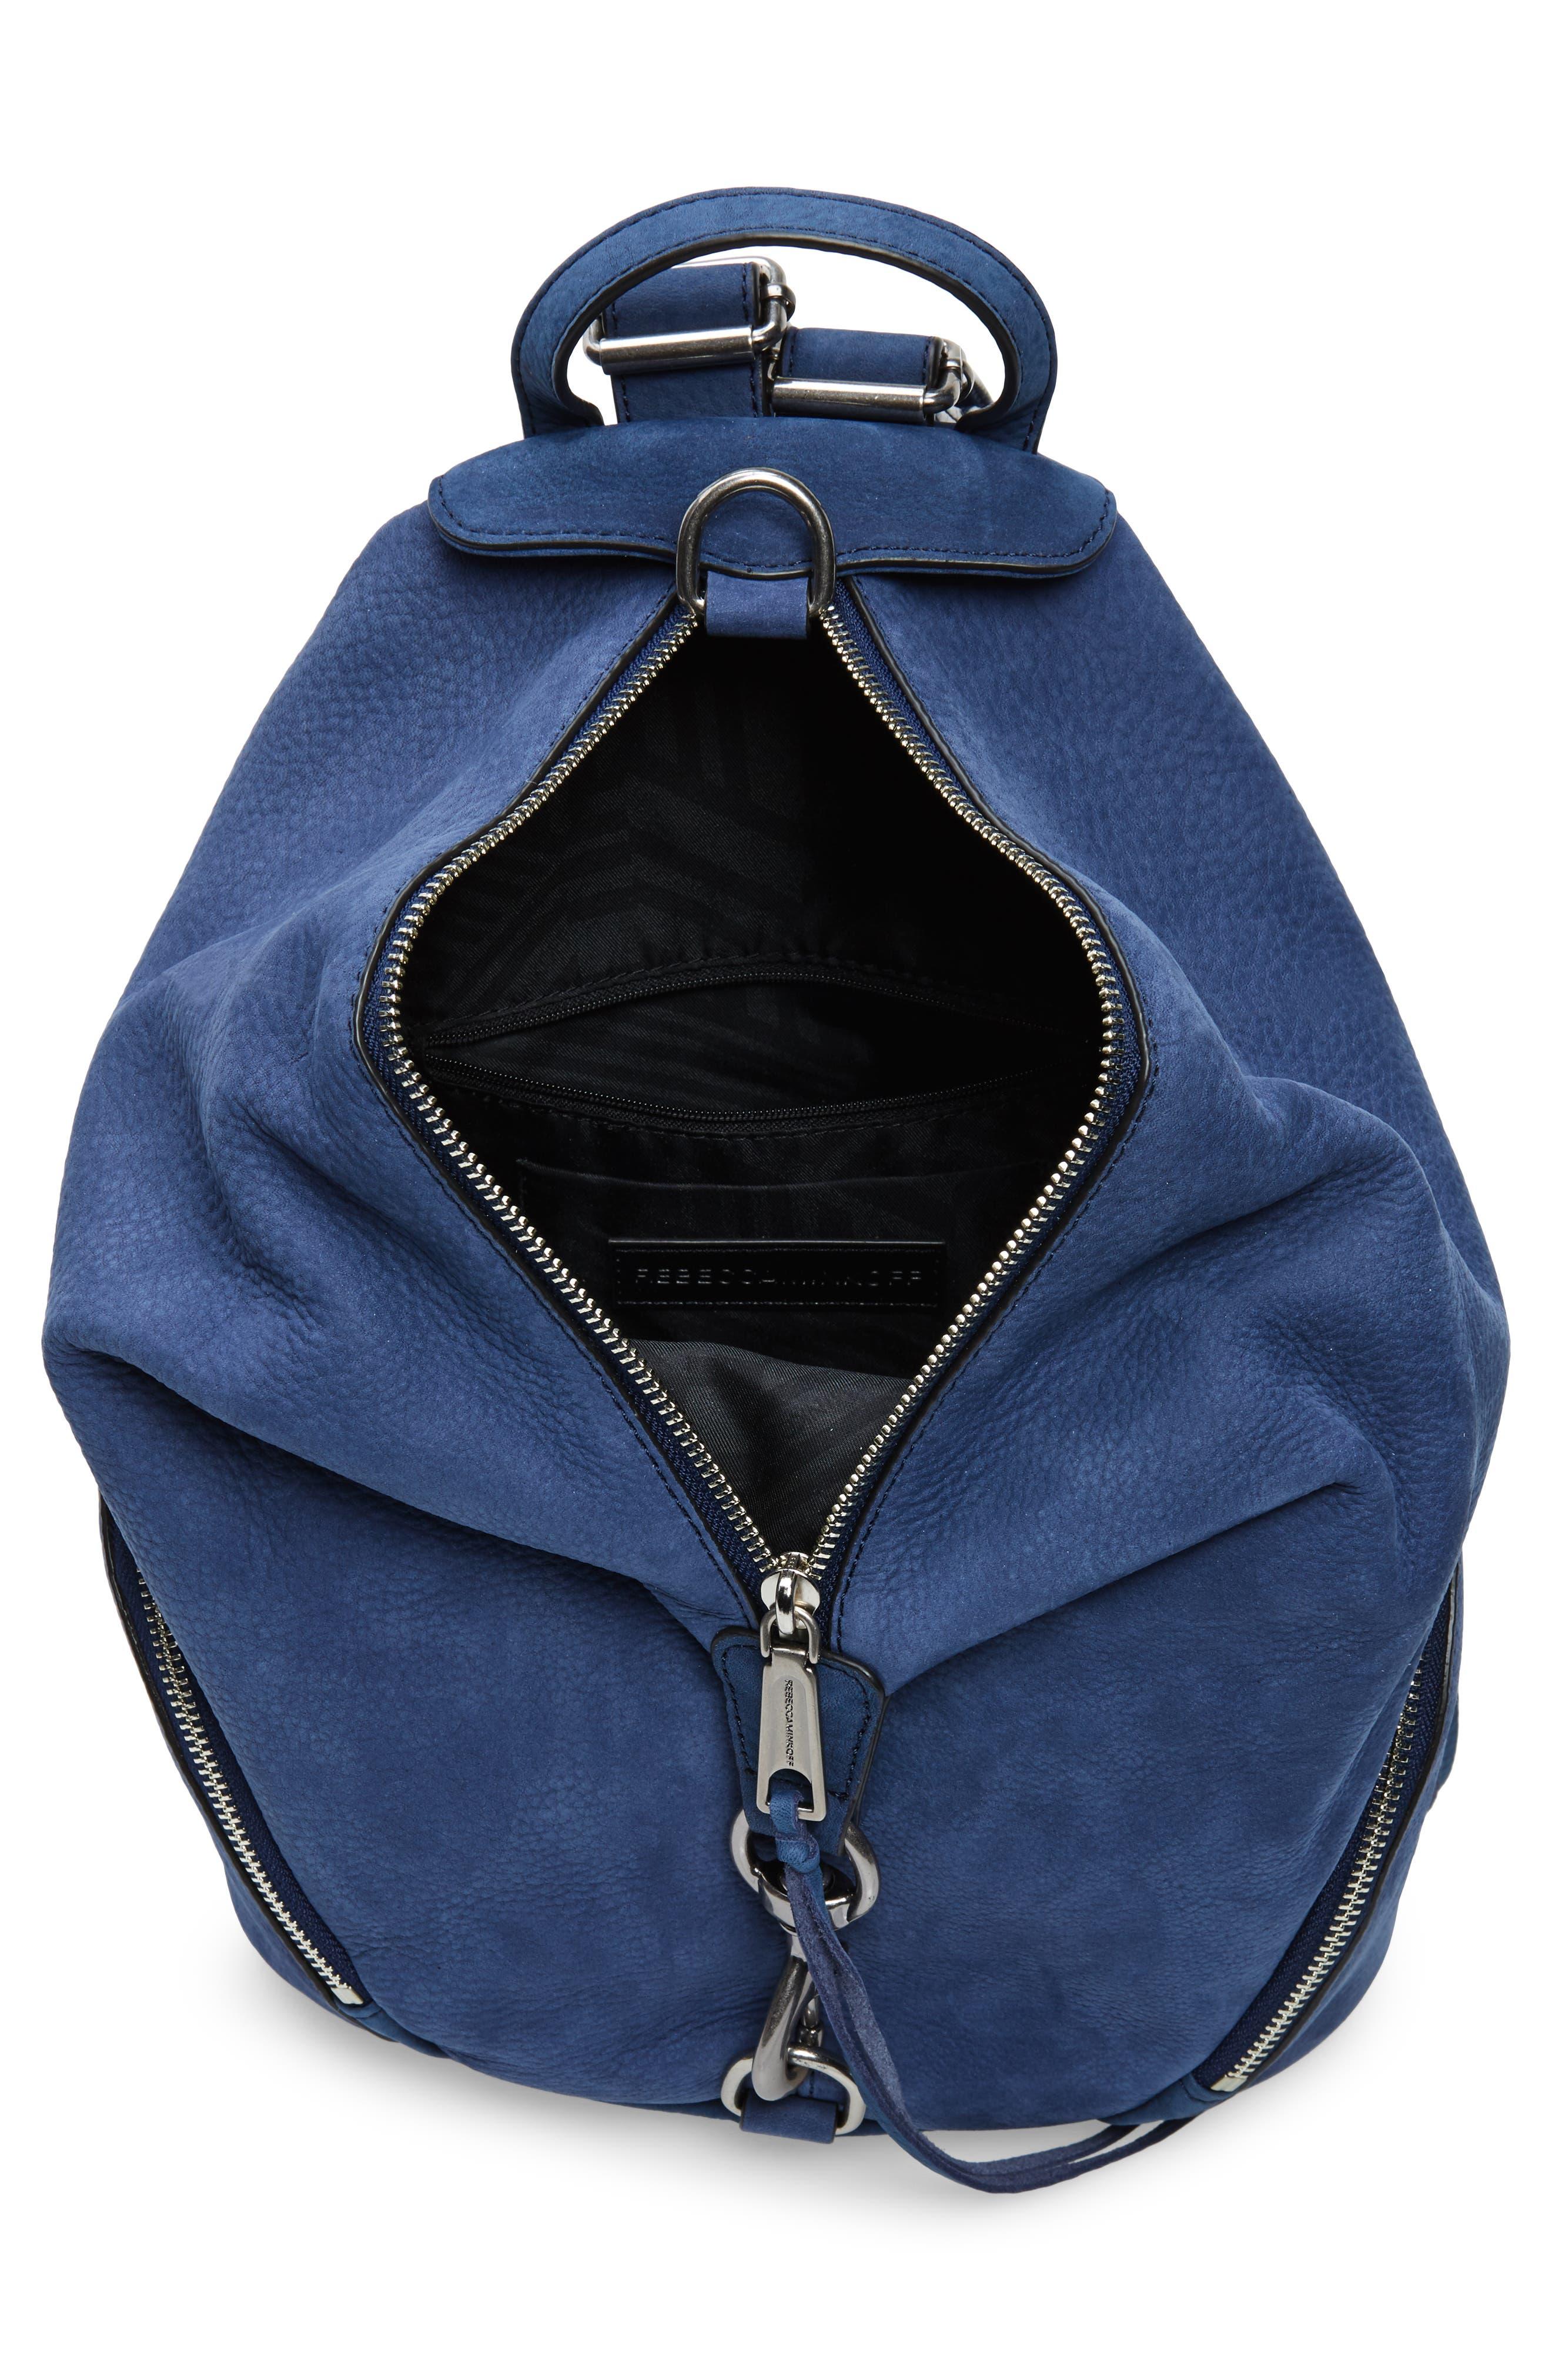 Julian Convertible Nubuck Leather Backpack,                             Alternate thumbnail 4, color,                             True Navy